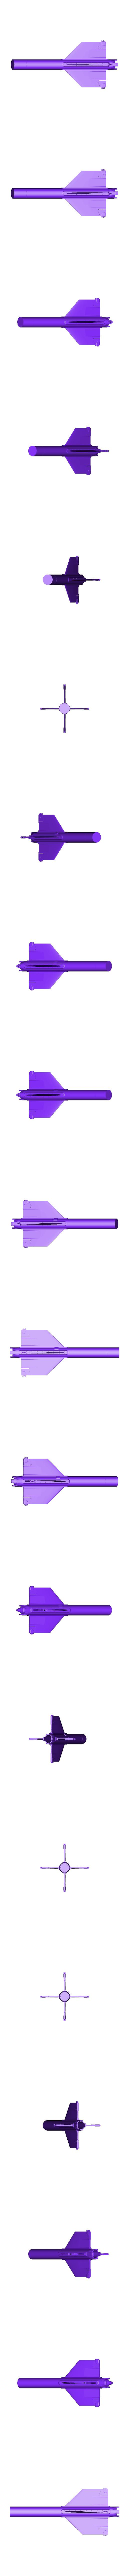 Aim9x Part 1.stl Download STL file AIM-9 Sidewinder • 3D printing design, Josefbouzgarrou